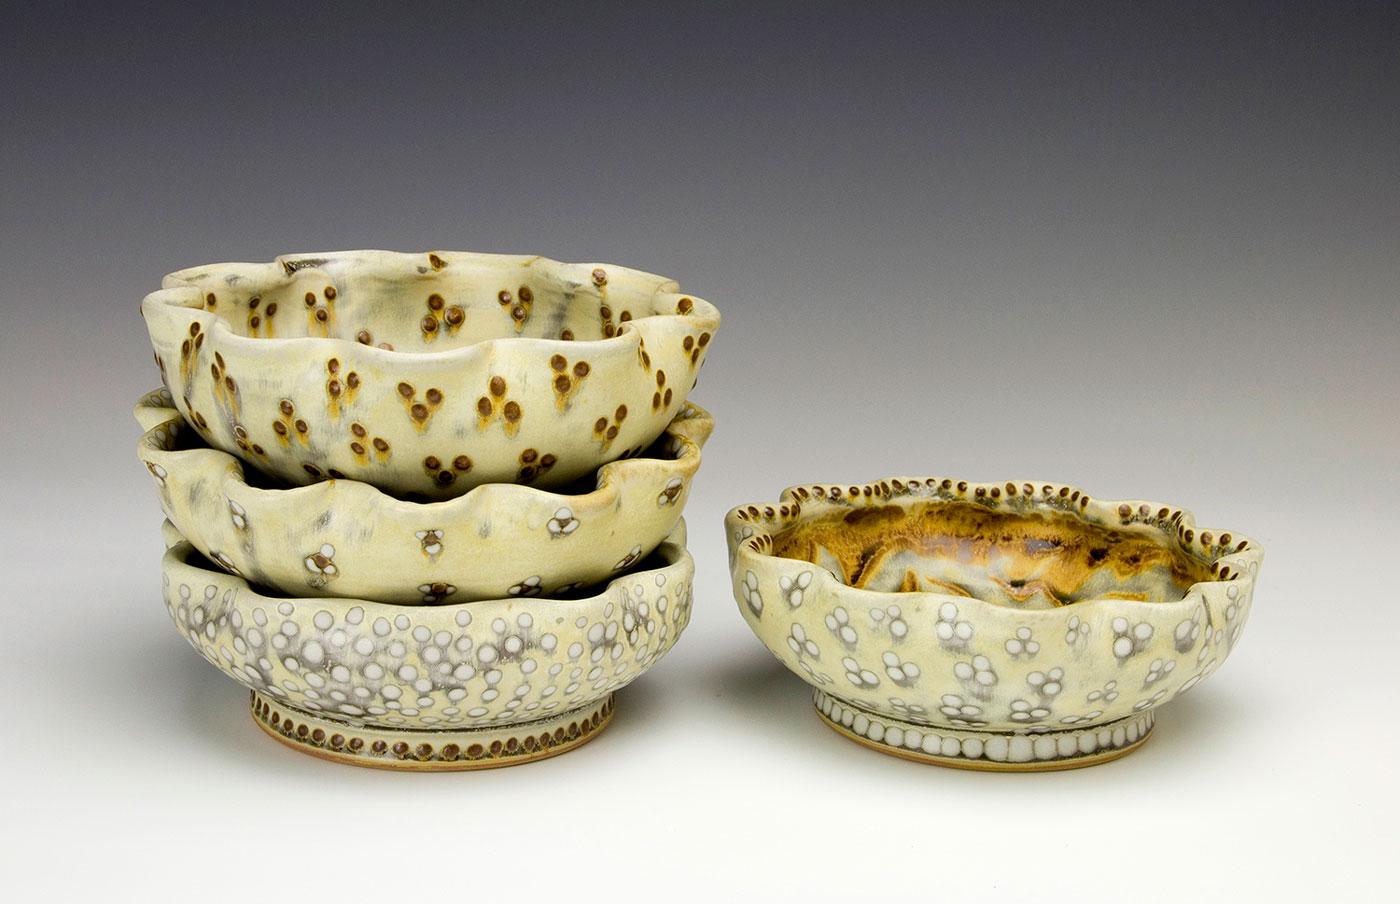 Bowl-grouping-Samantha-Henneke-Seagrove-Pottery.jpg